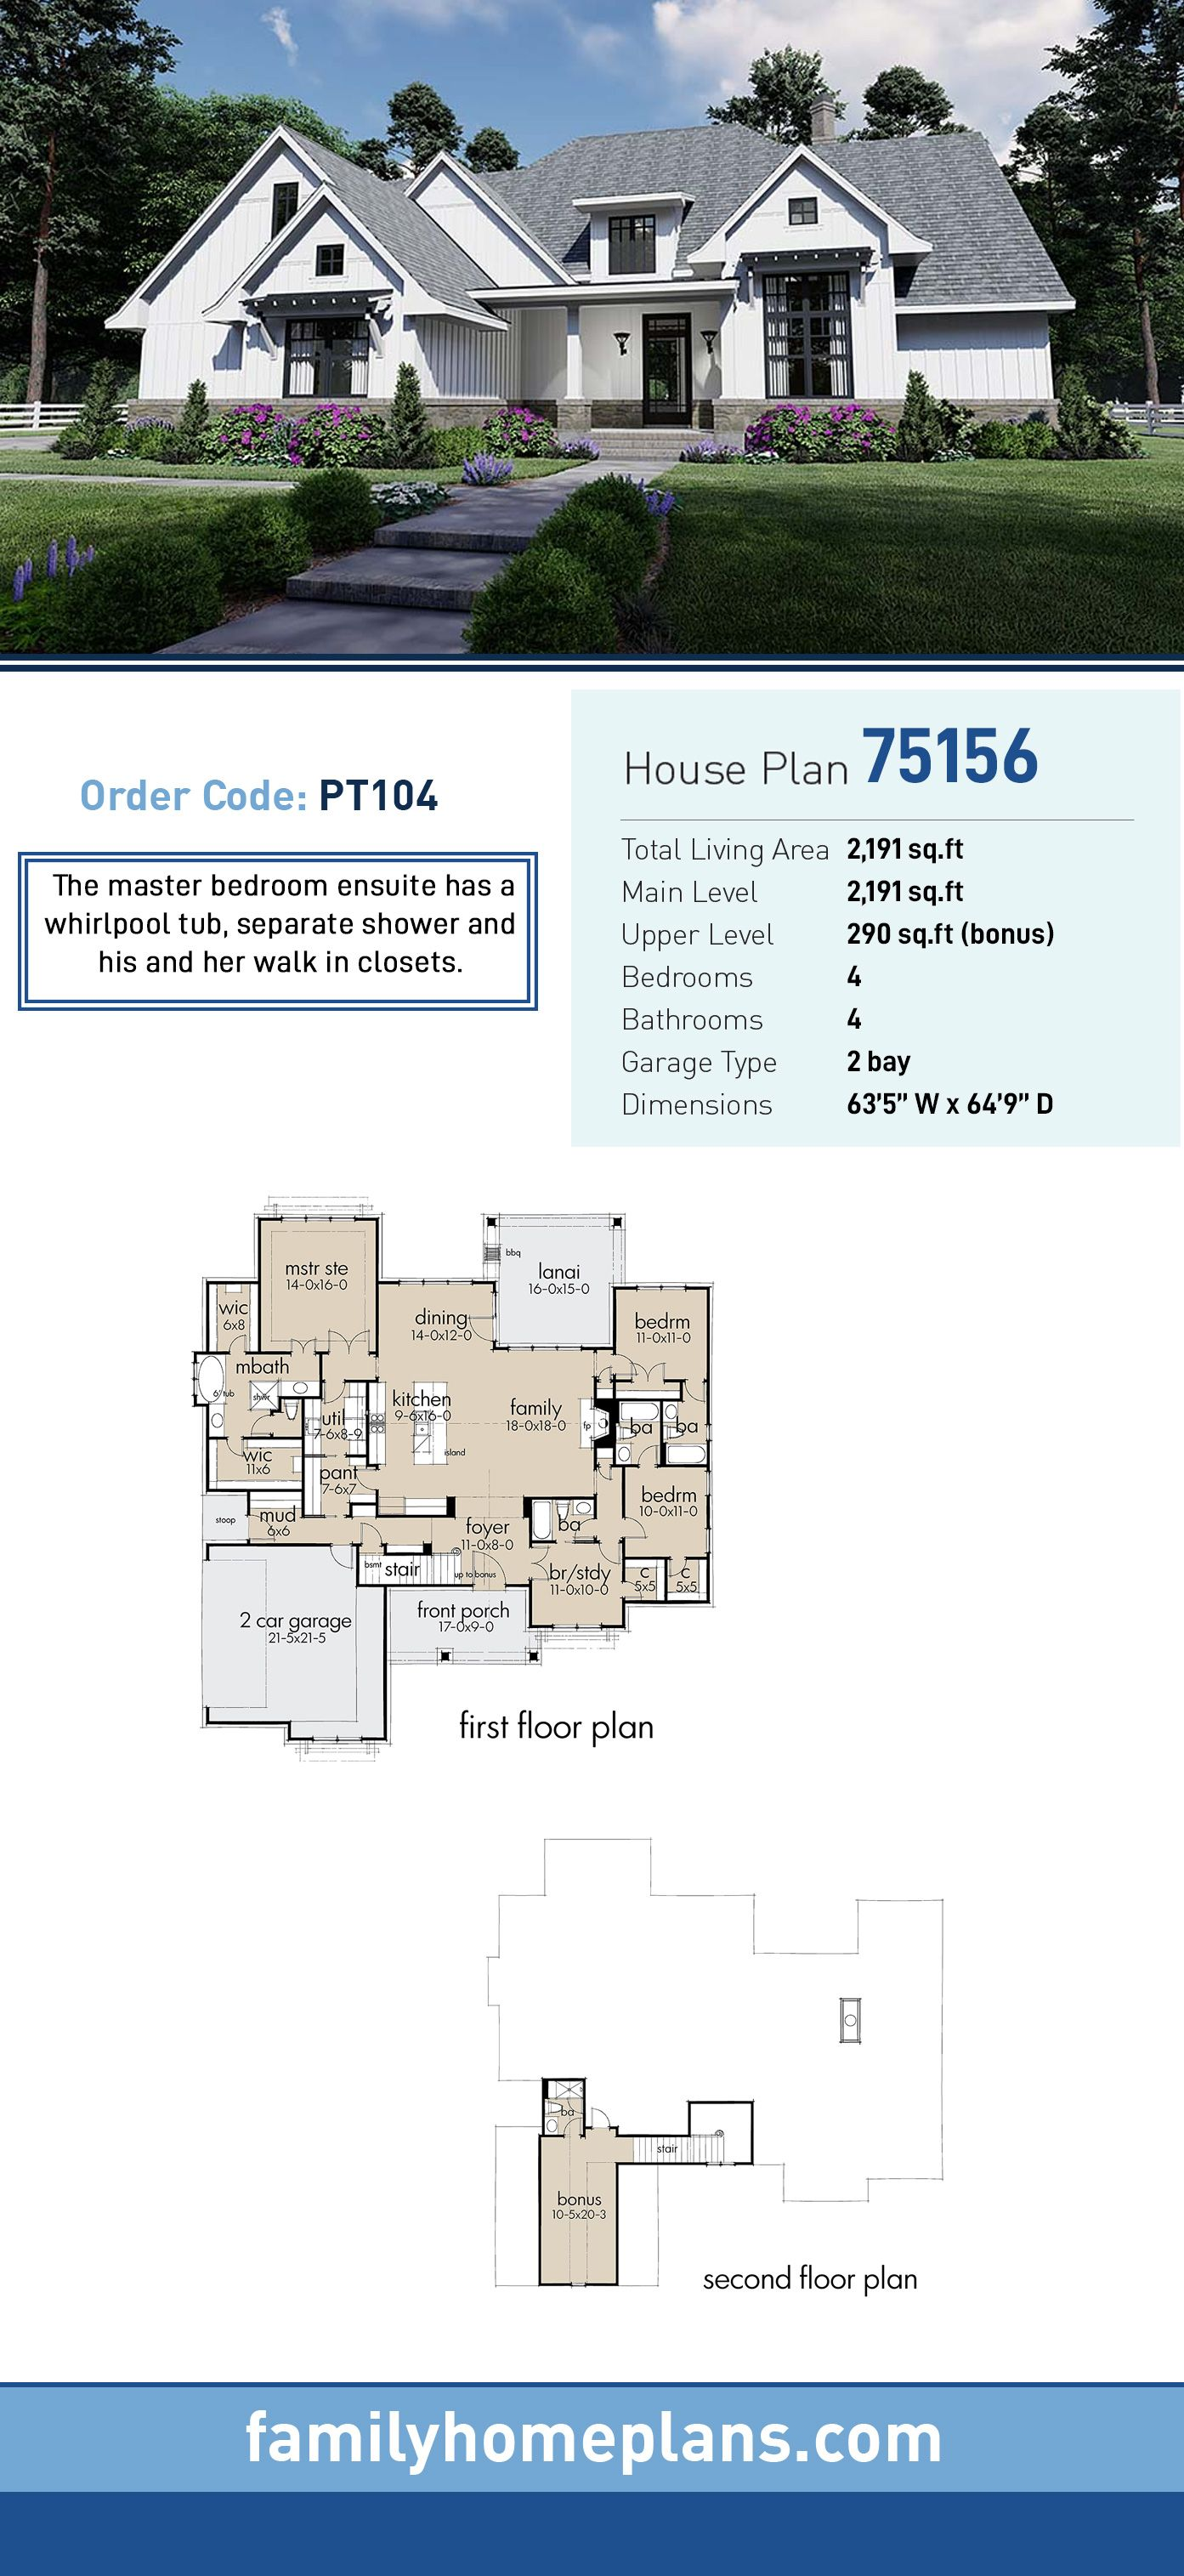 Southern Style House Plan 75156 With 4 Bed 4 Bath 2 Car Garage Farmhouse Plans Pool House Plans House Plans Farmhouse